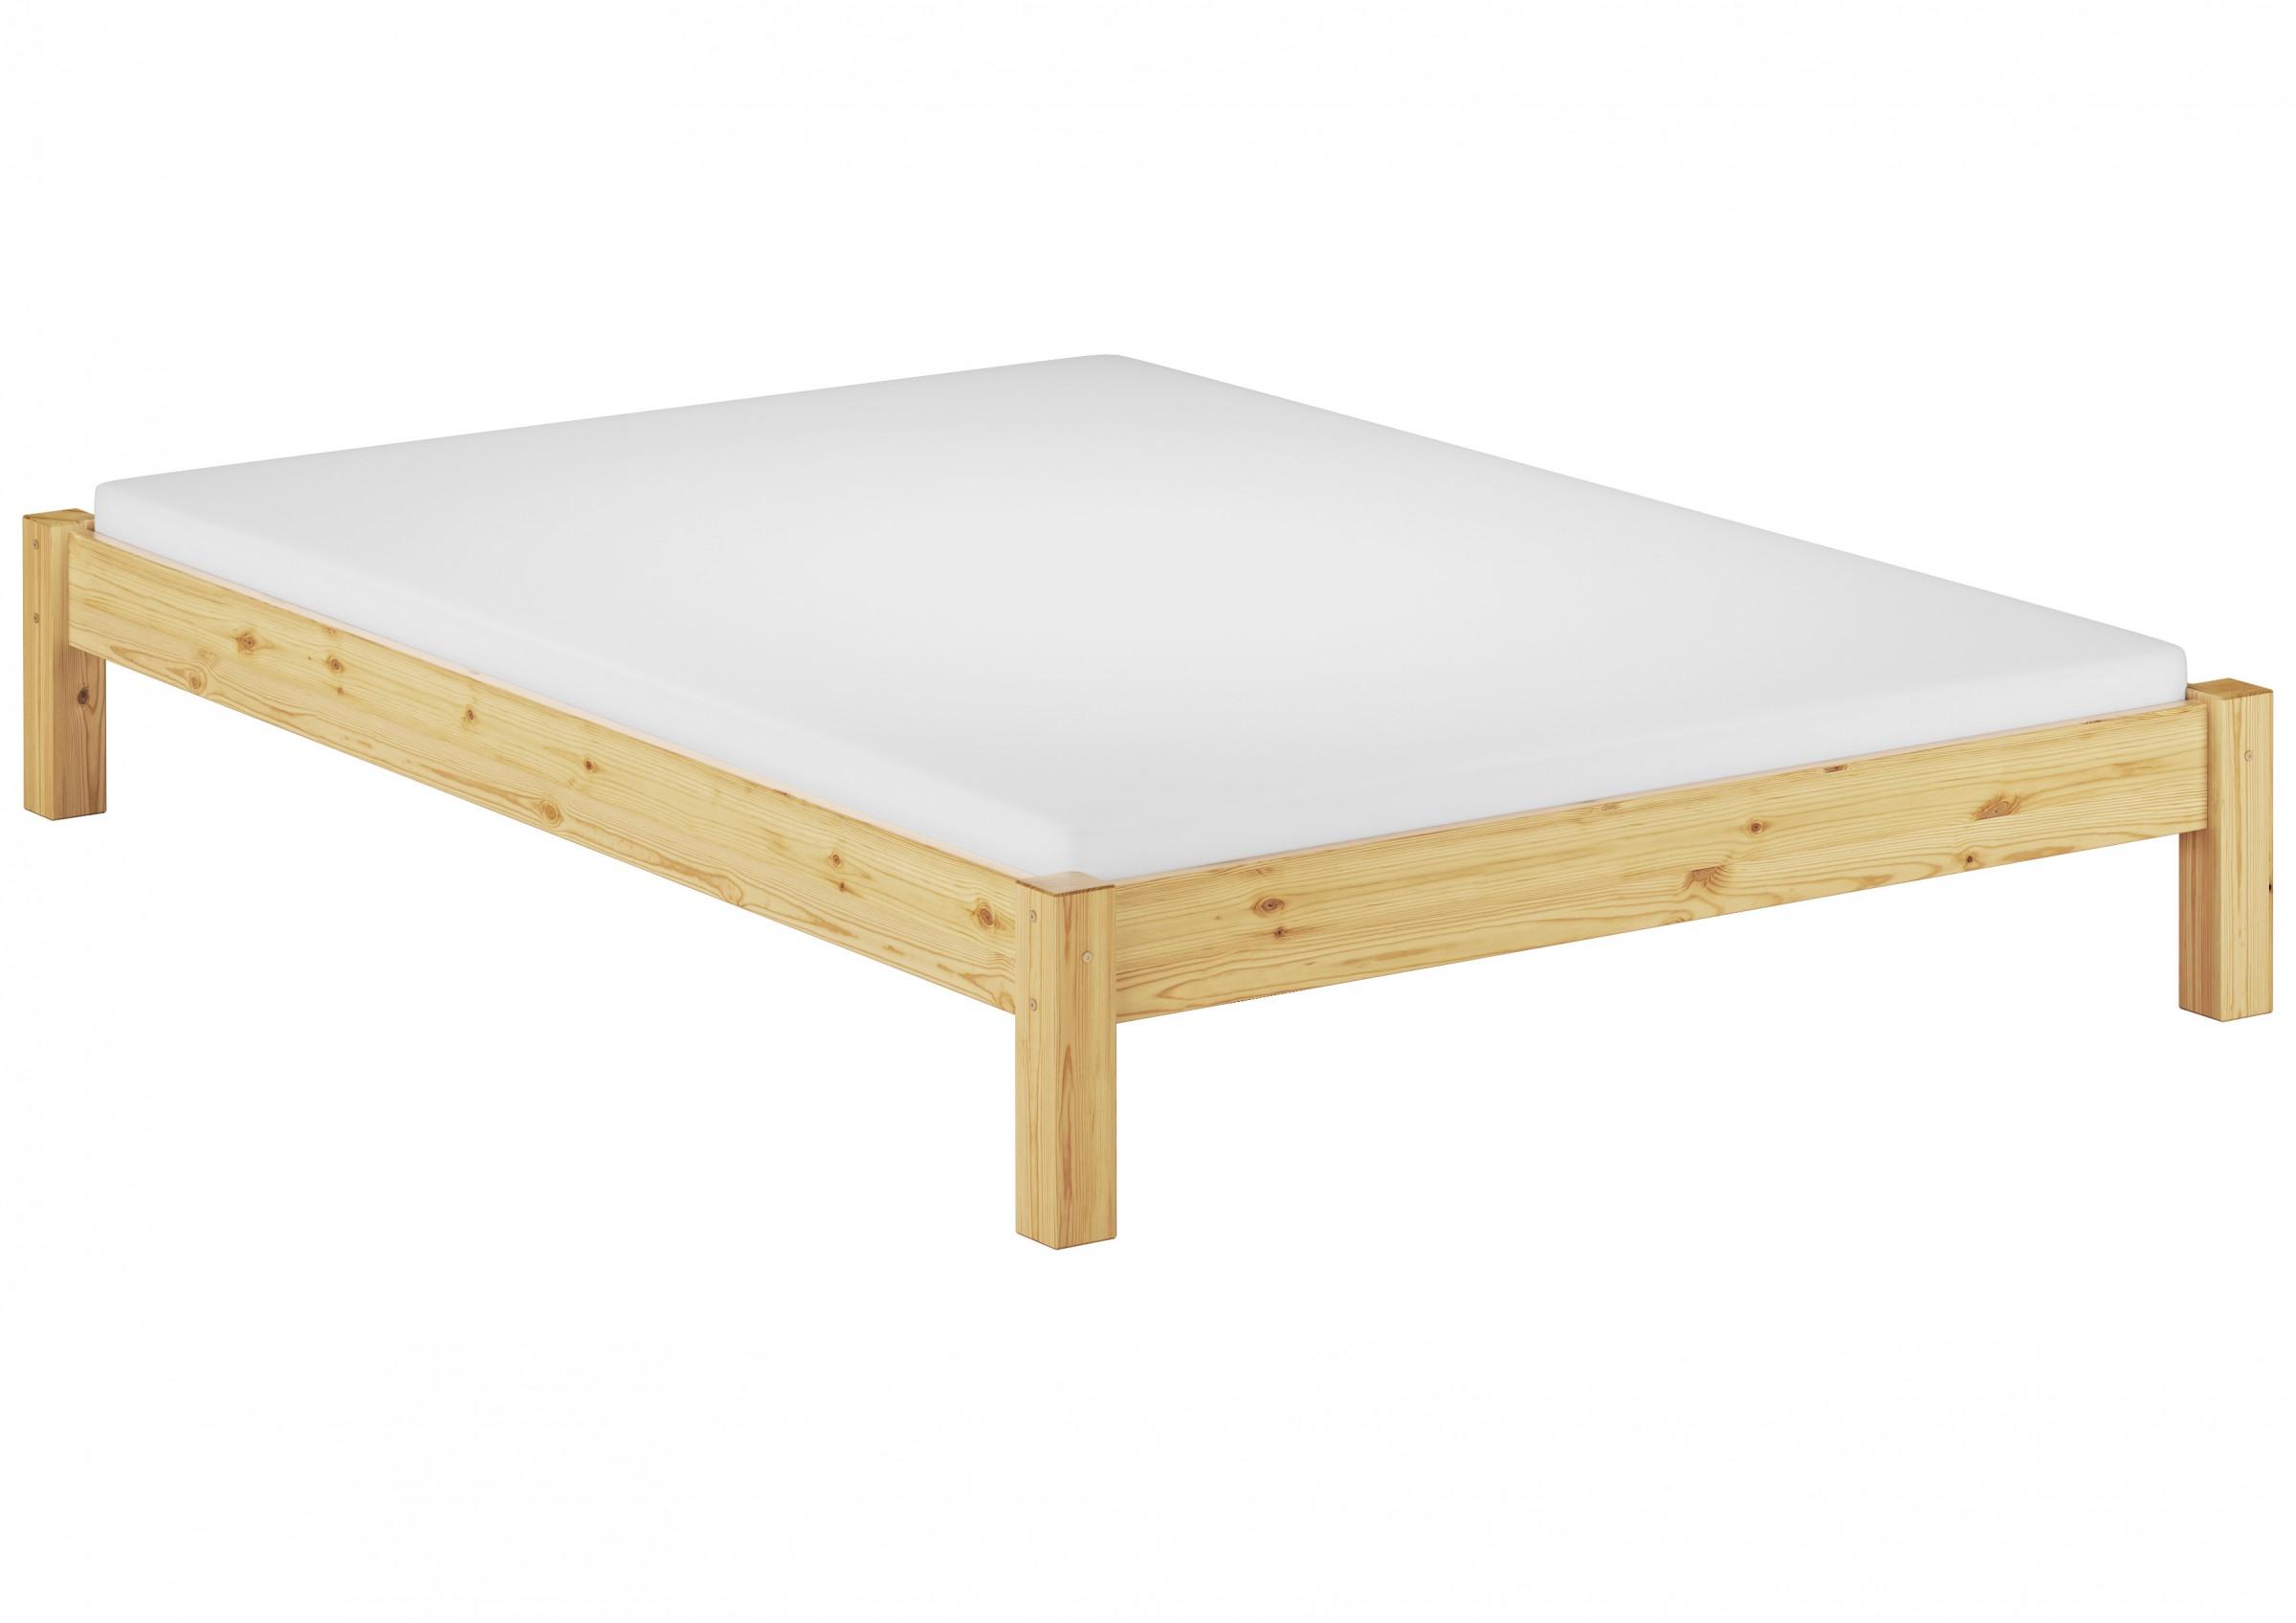 bettgestell kiefer einzelbett 120x200 massivholzbett matratze rollrost ebay. Black Bedroom Furniture Sets. Home Design Ideas